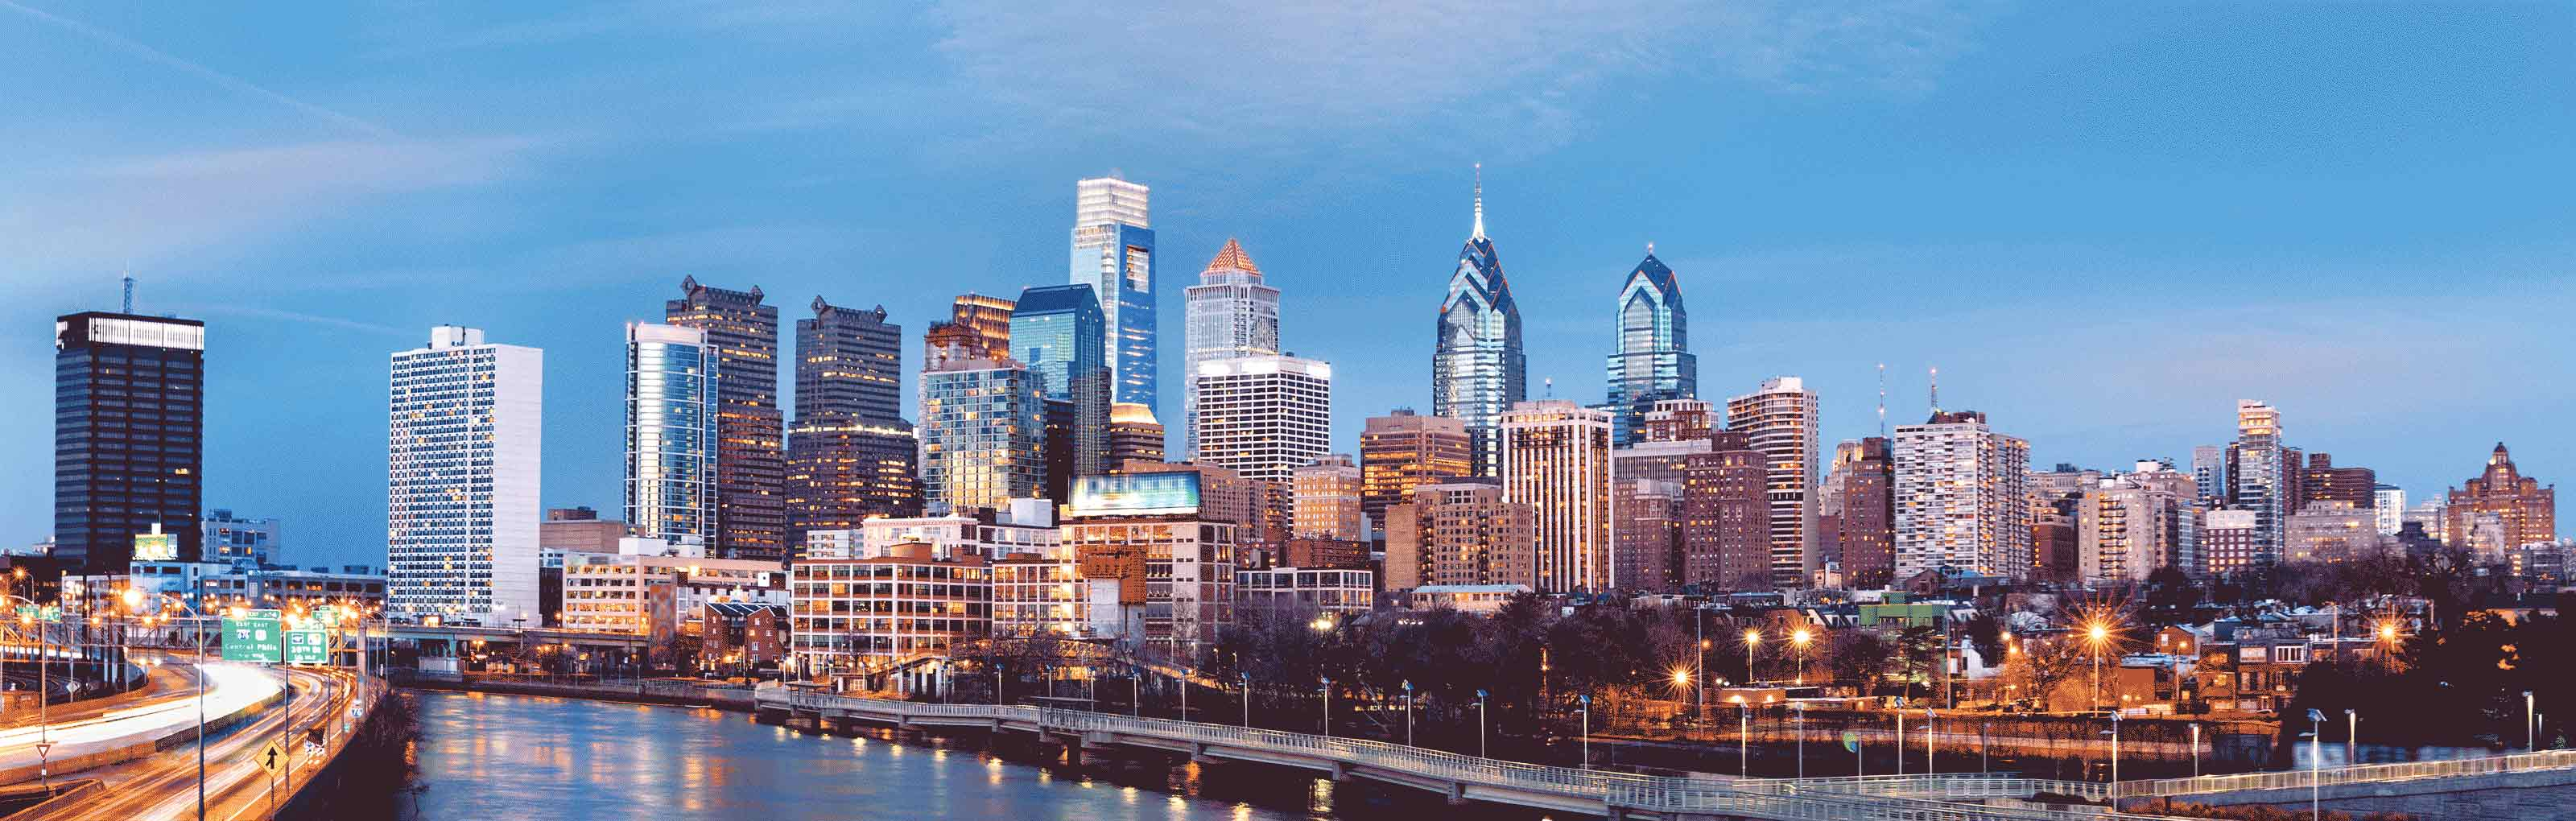 Philadelphia Charter Bus Company | Pennsylvania Bus Rentals